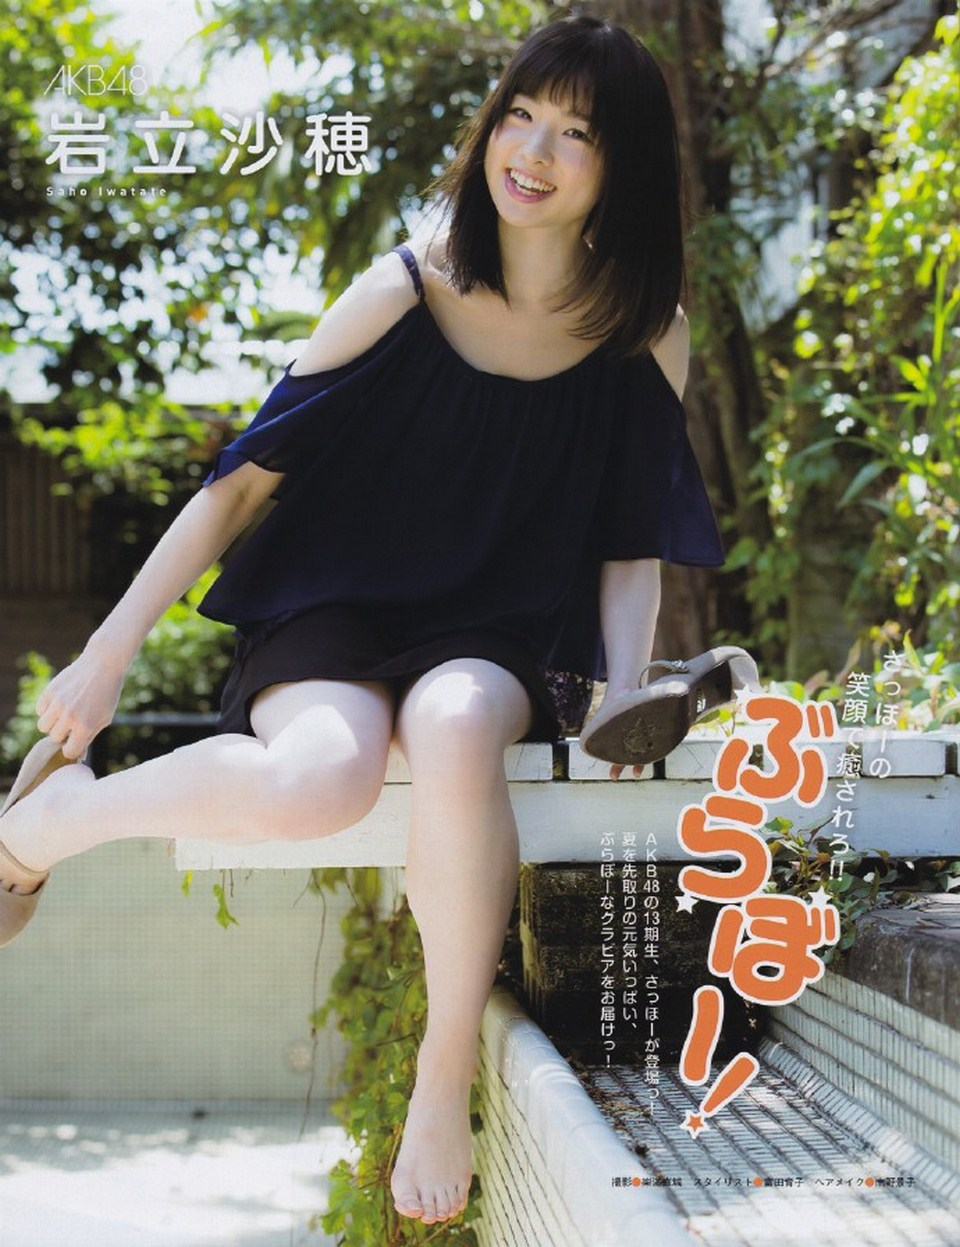 Iwatate Saho 岩立沙穂 AKB48, EX Taishu Magazine 2016.05 Gravure